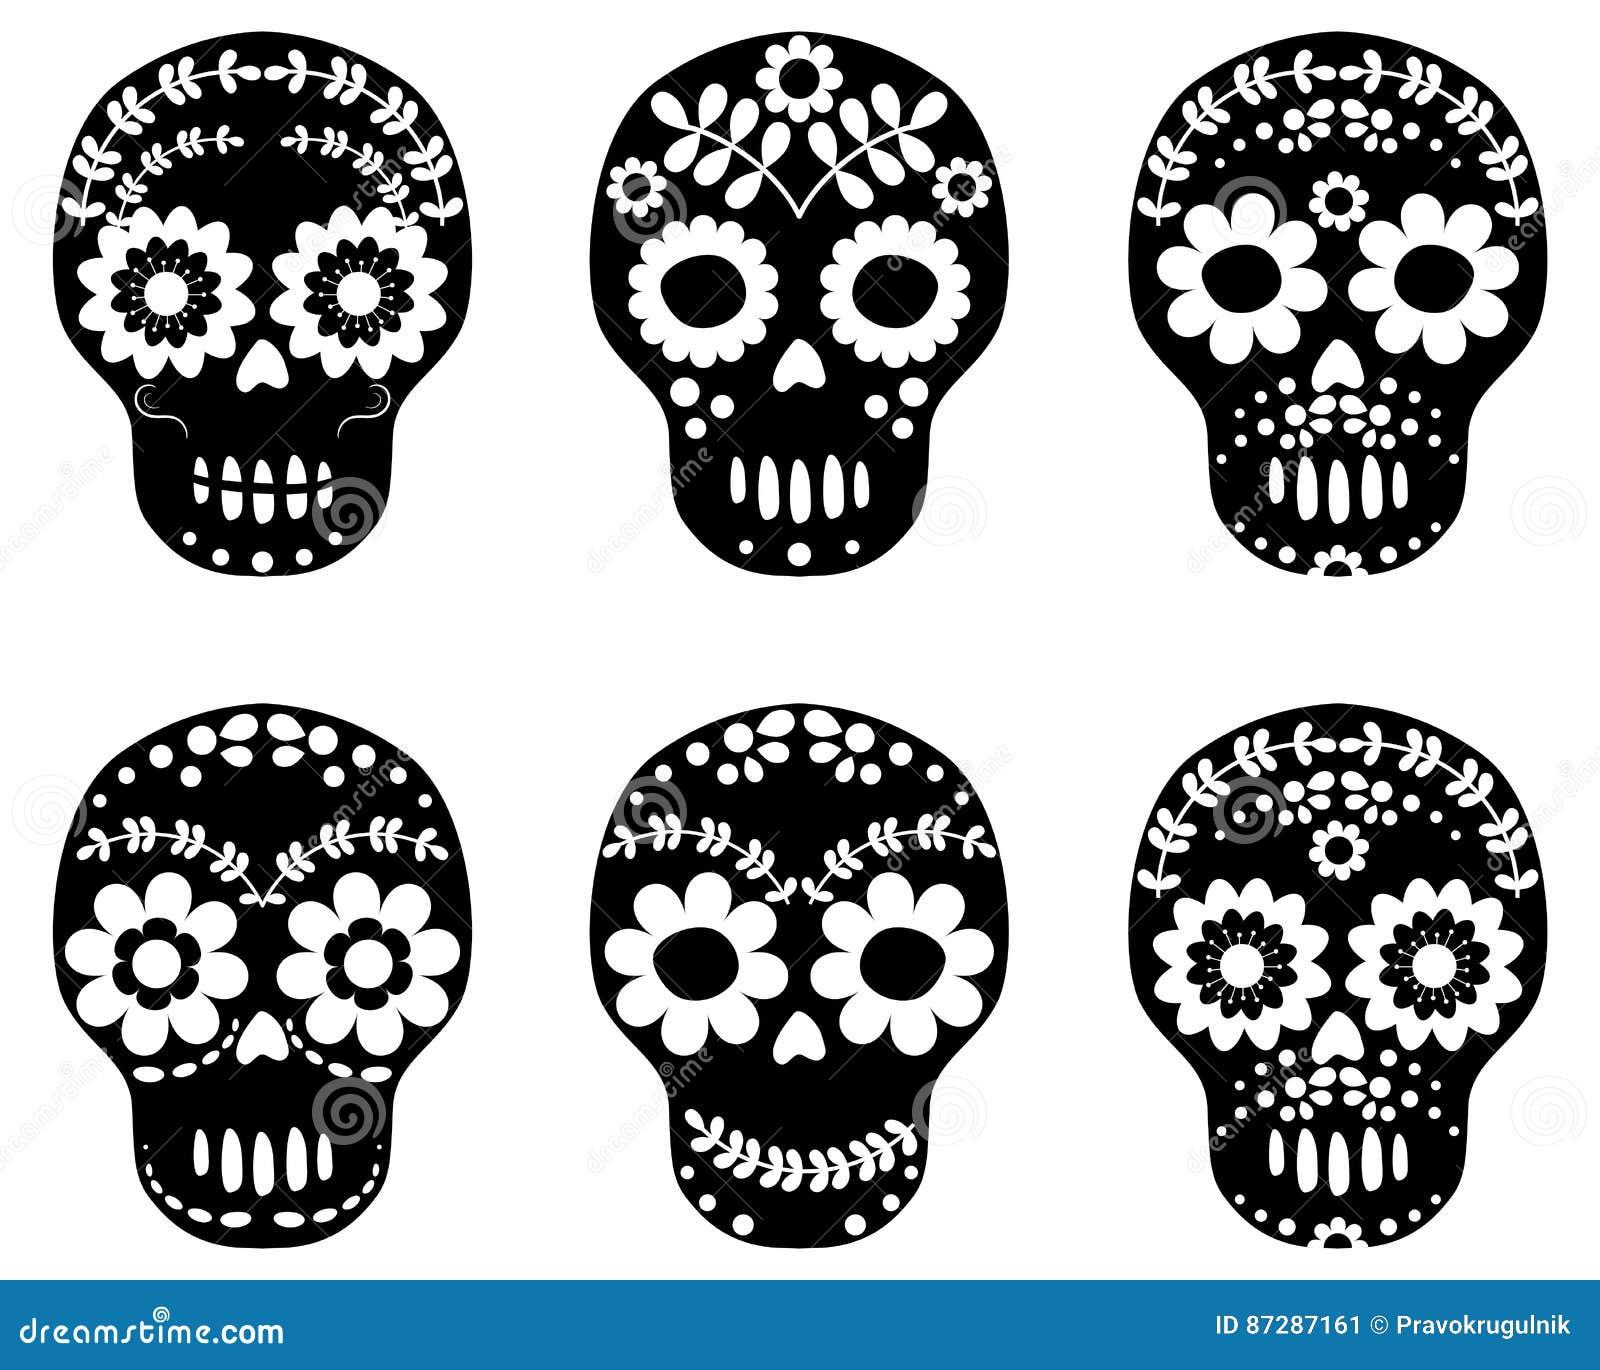 Black And White Floral Sugar Skulls Stock Vector Illustration Of